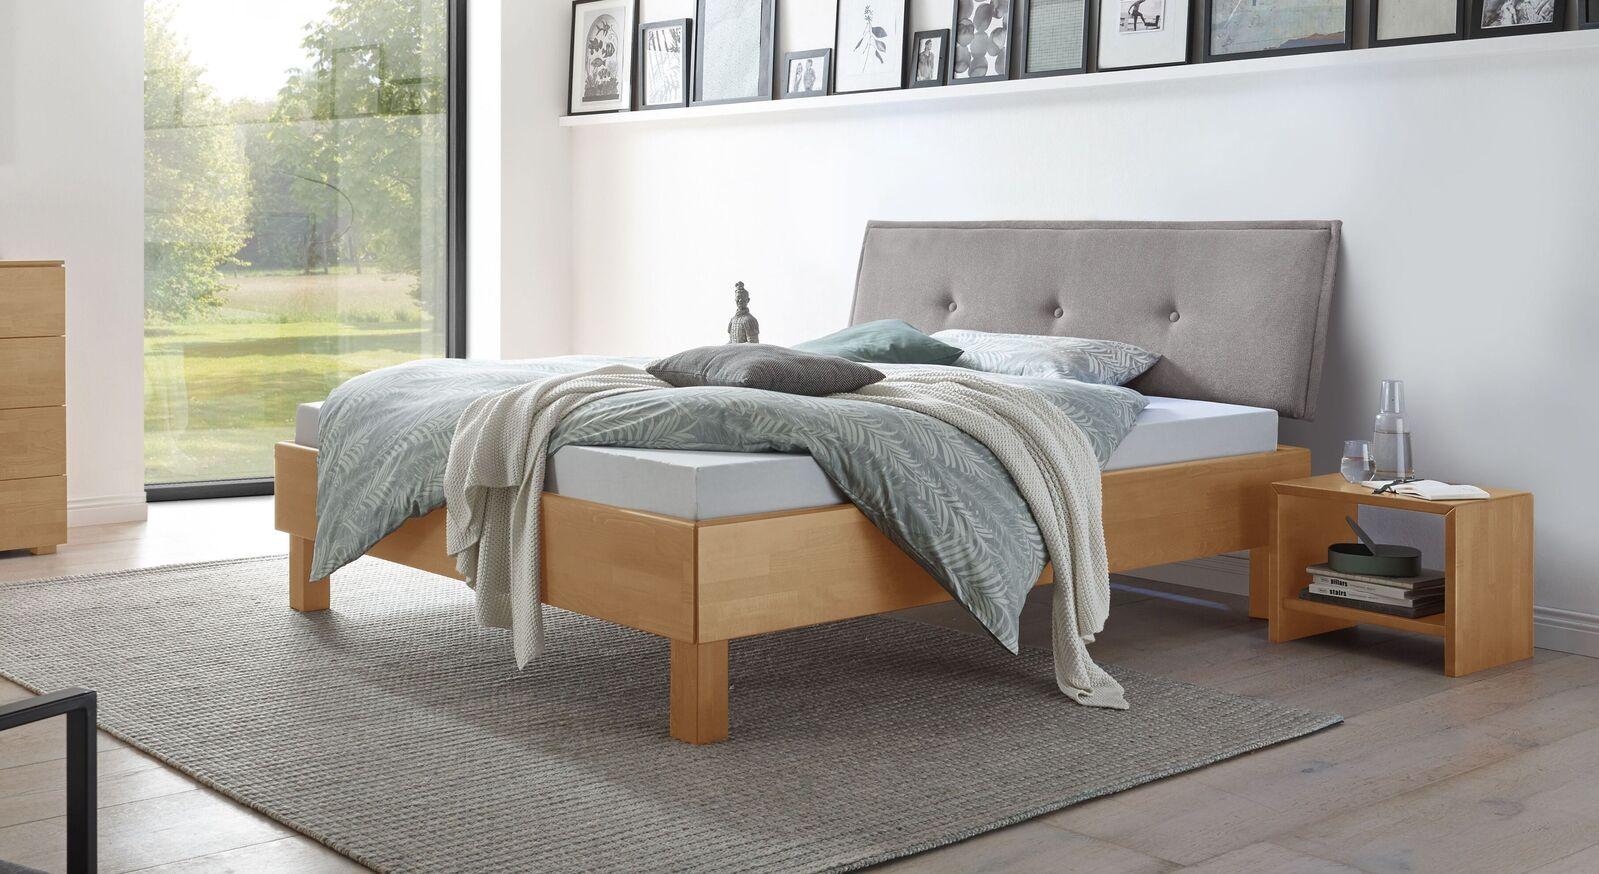 Bett Fenzlo aus natürlichem Buchenholz